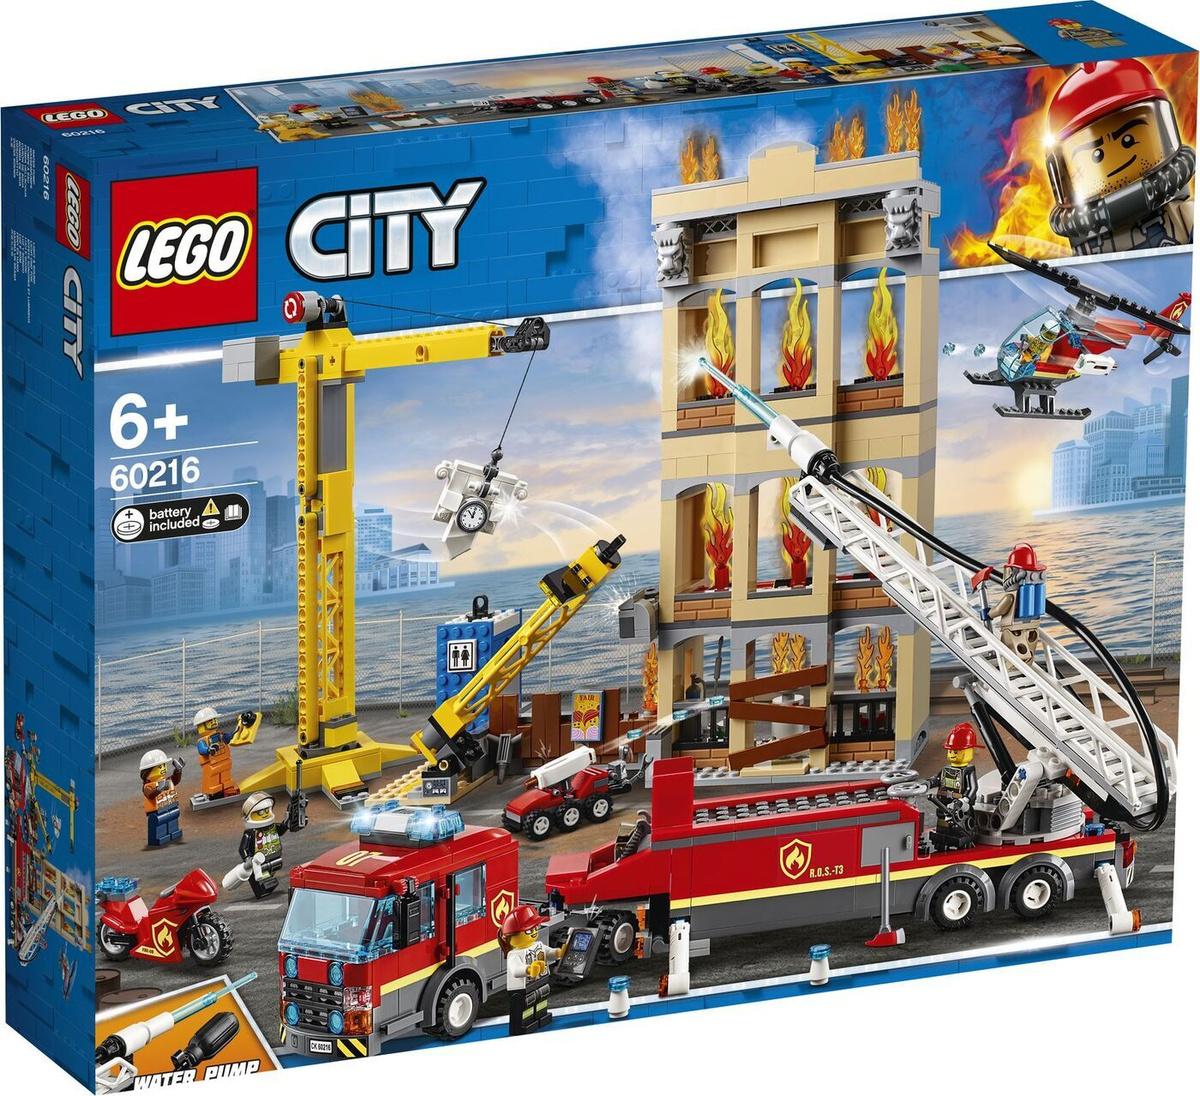 Конструктор LEGO City Fire 60216 Центральная пожарная станция #1